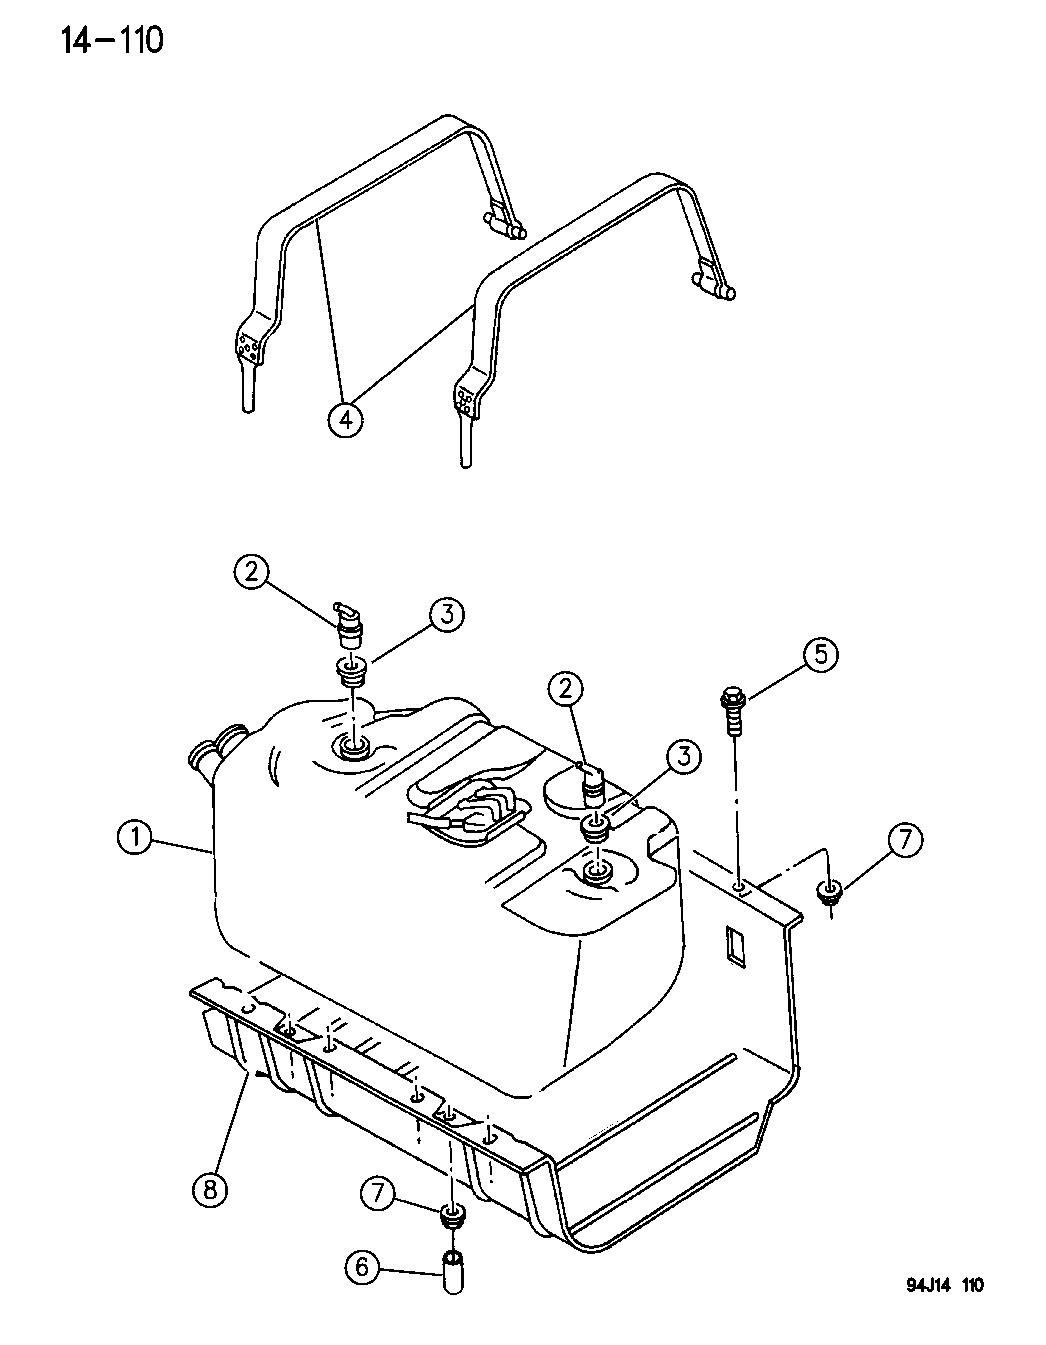 1994 jeep wrangler fuel tank